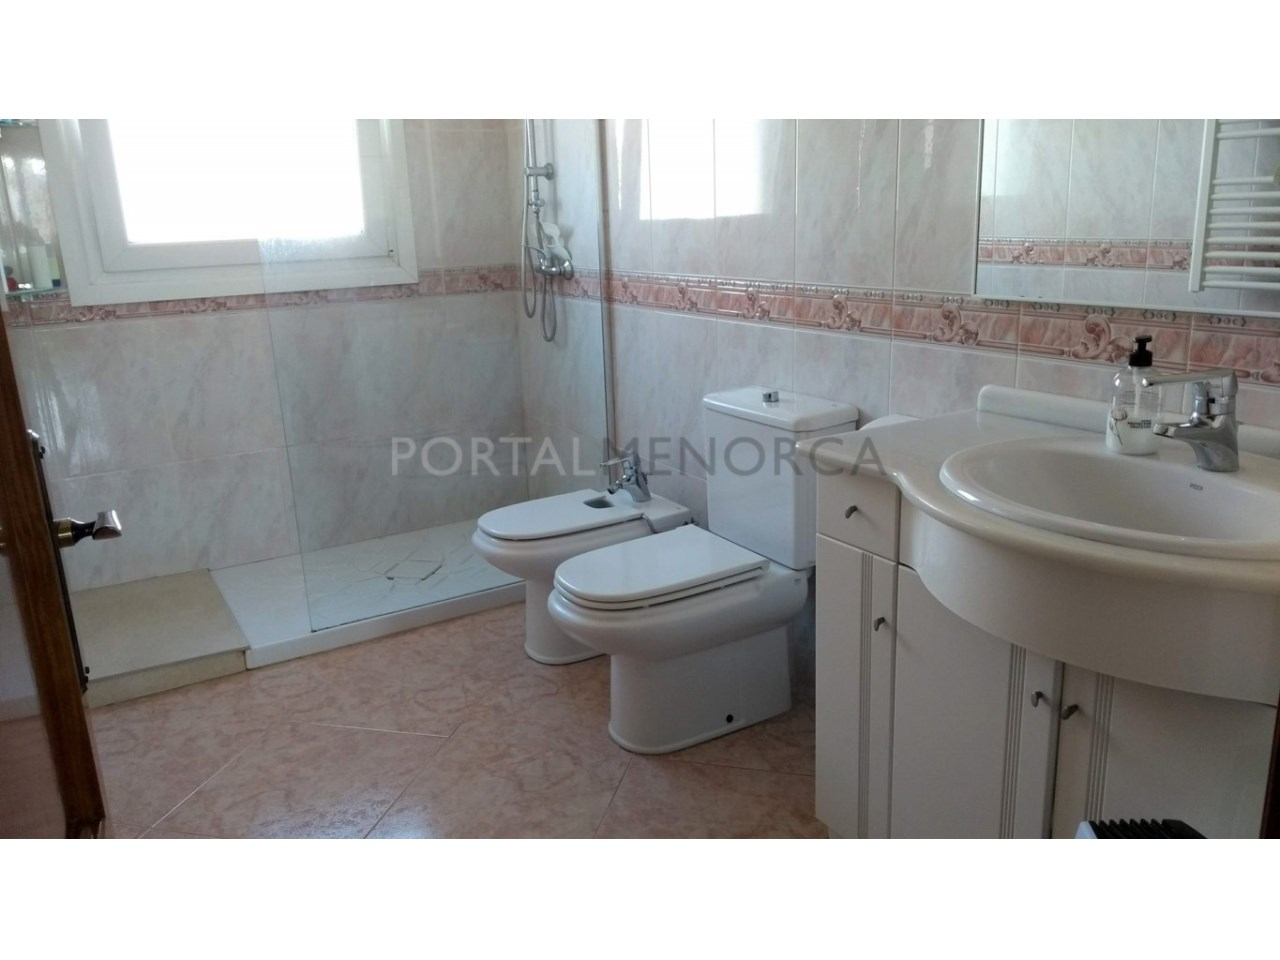 Charming villa with garage in Son Oleo for sale-bathroom